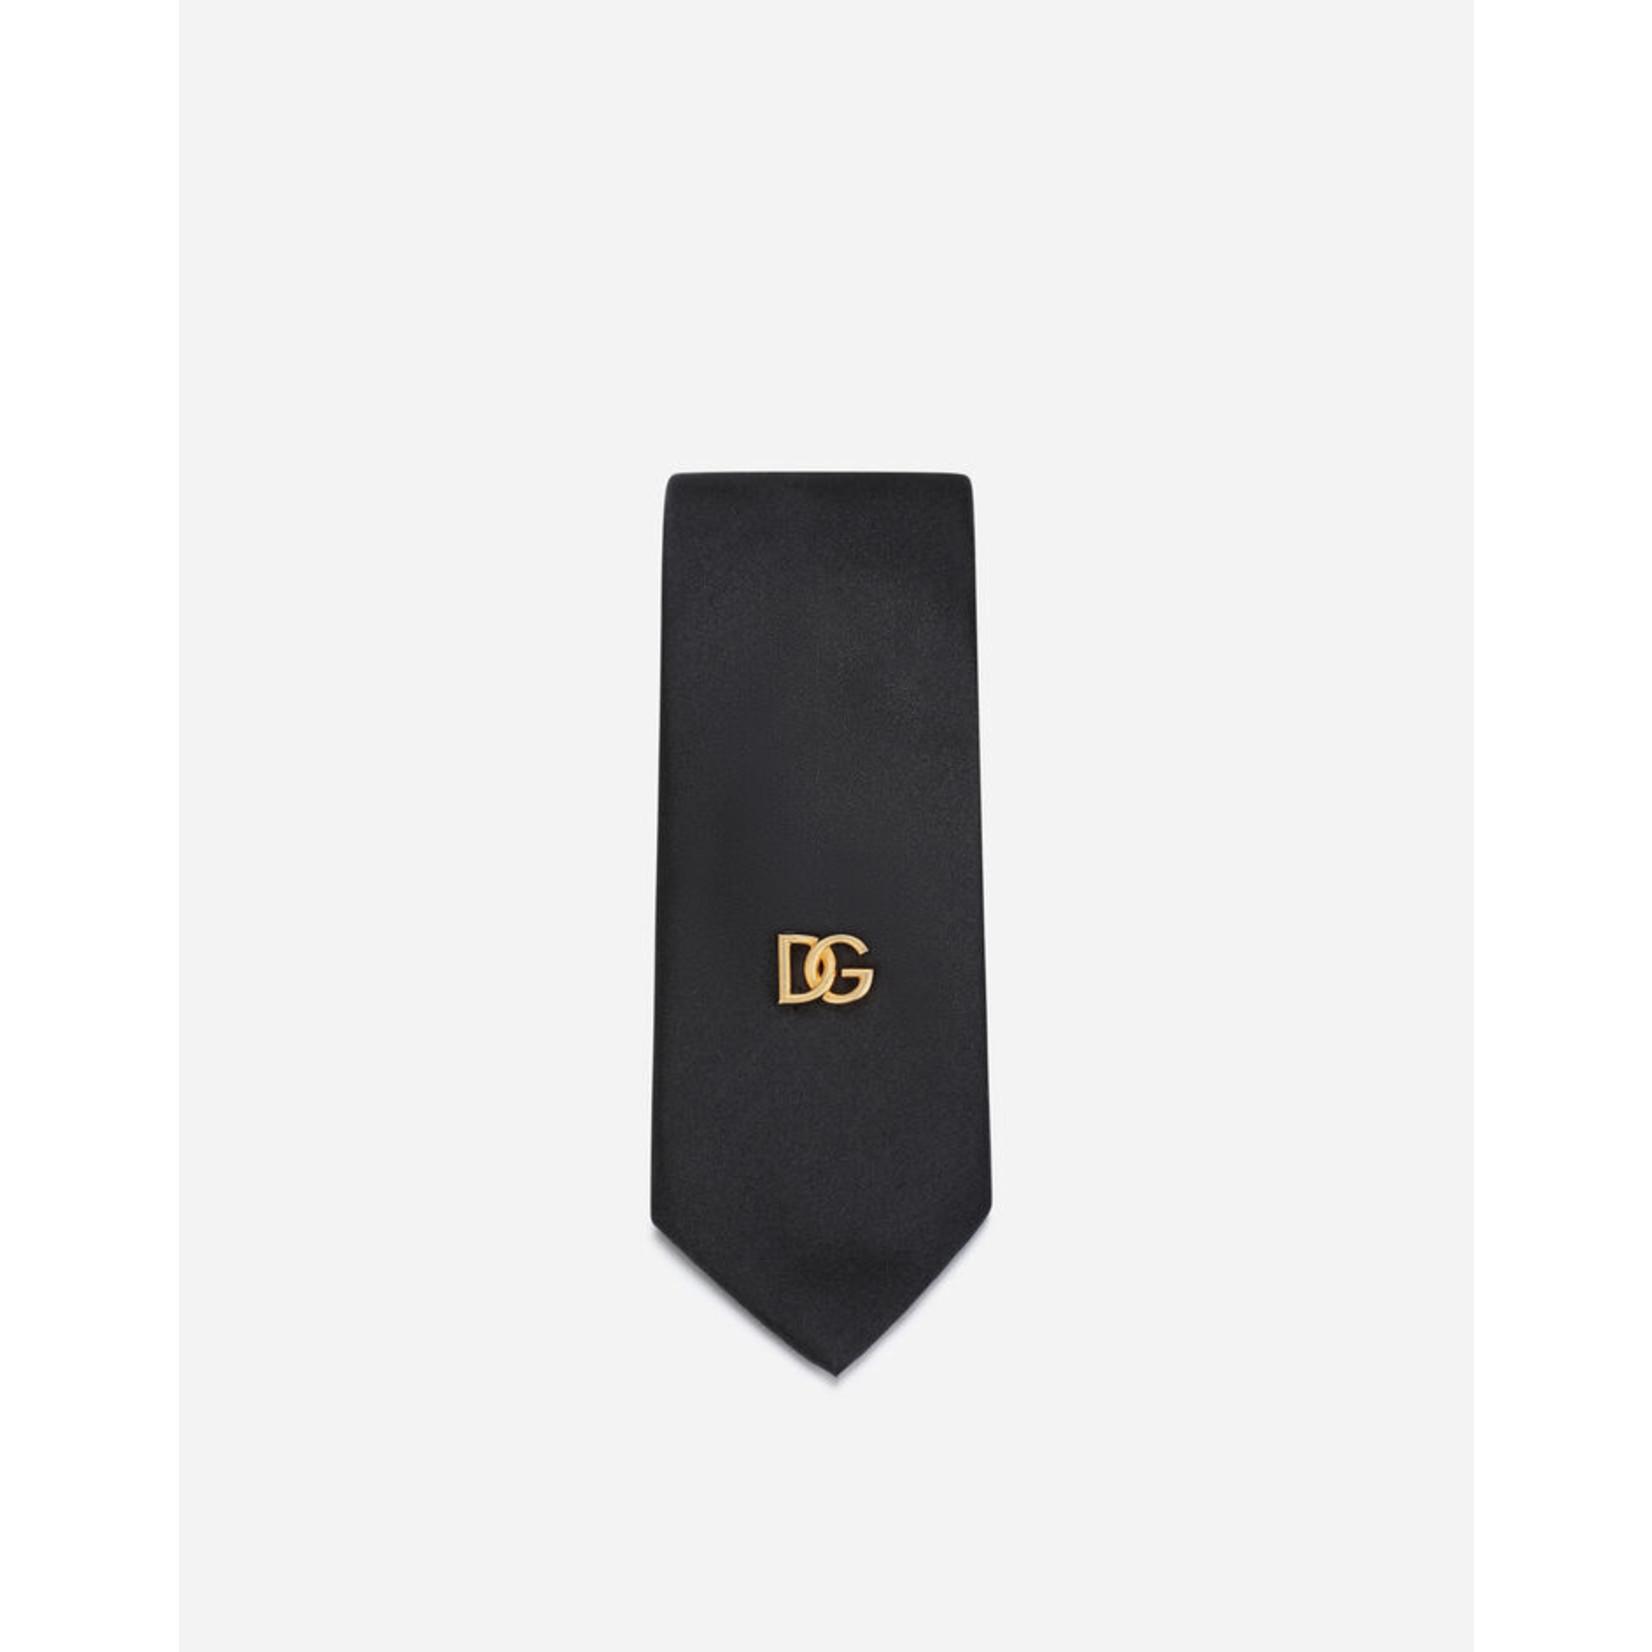 Dolce&Gabbana acc Das 42664